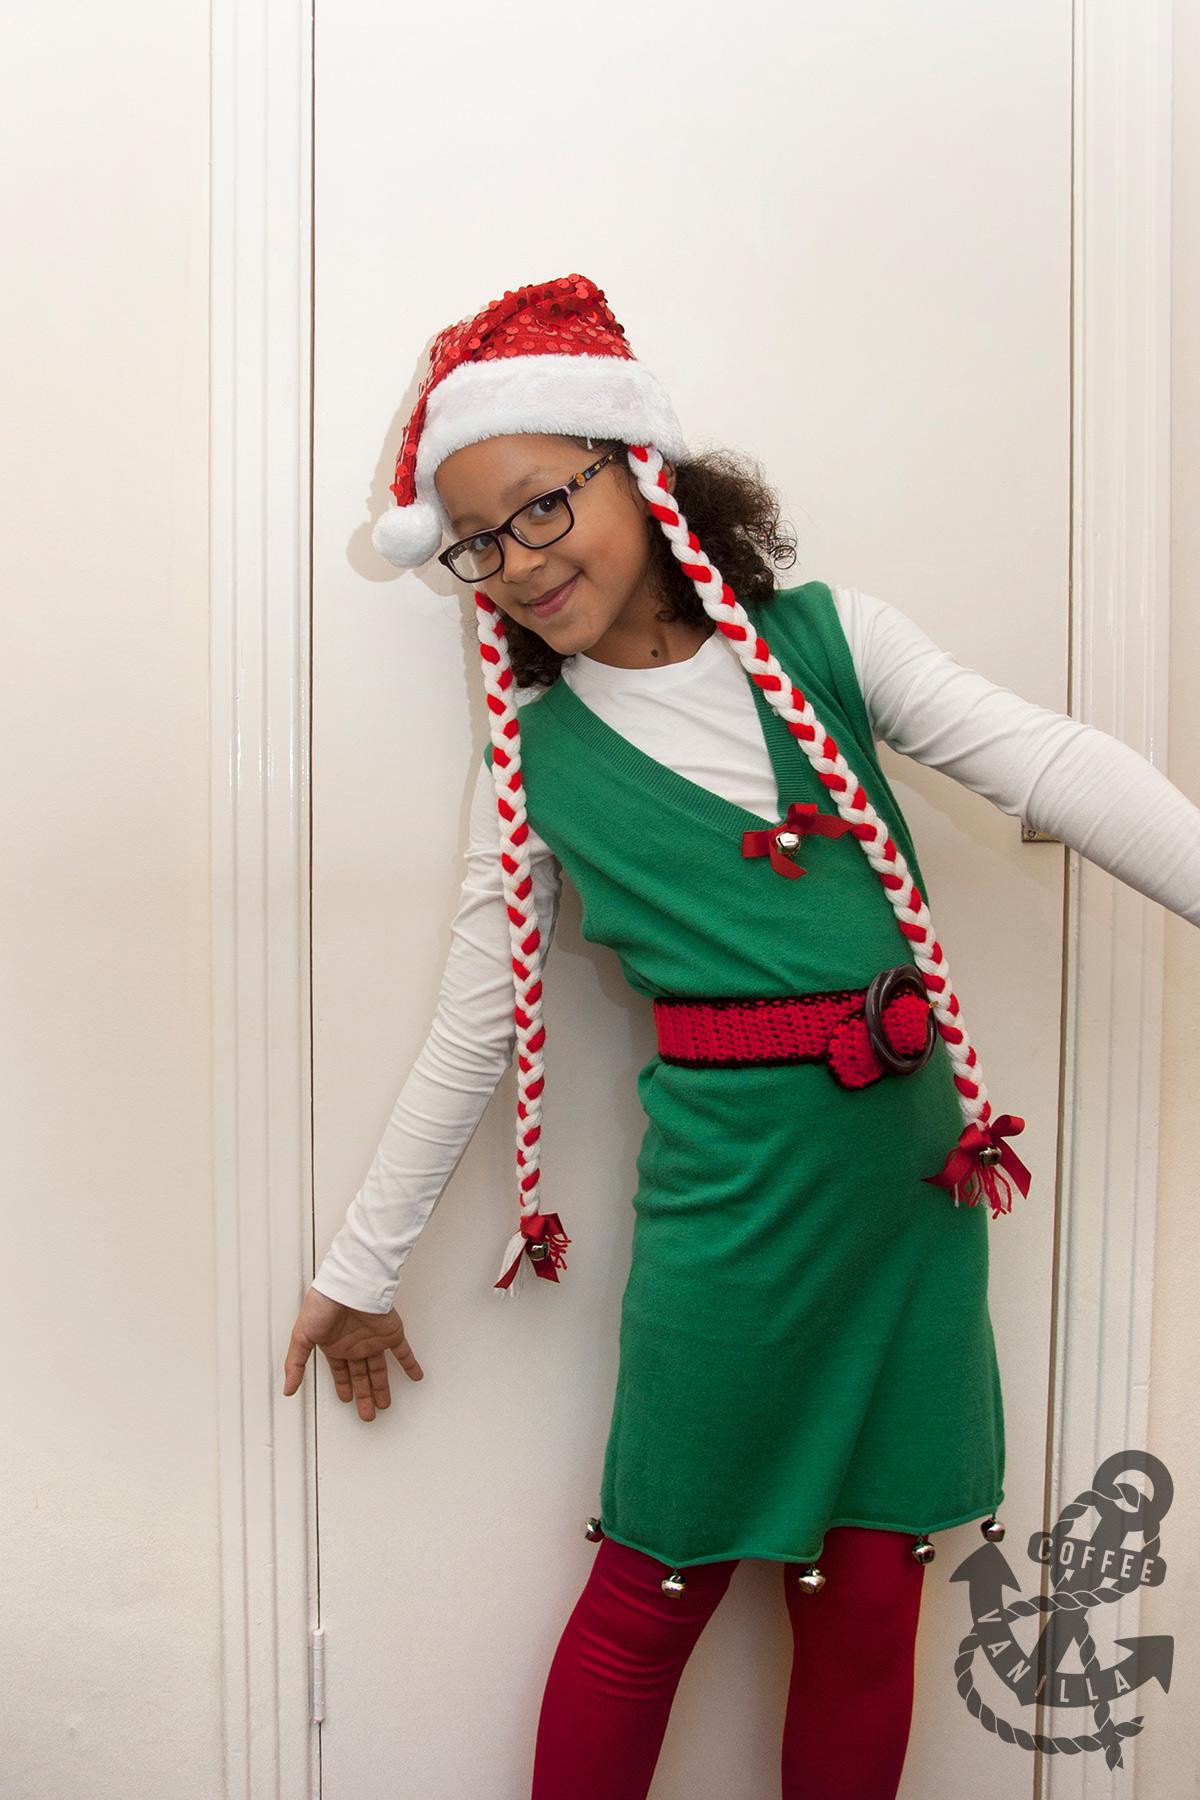 Elf girl masterbates sexual movies